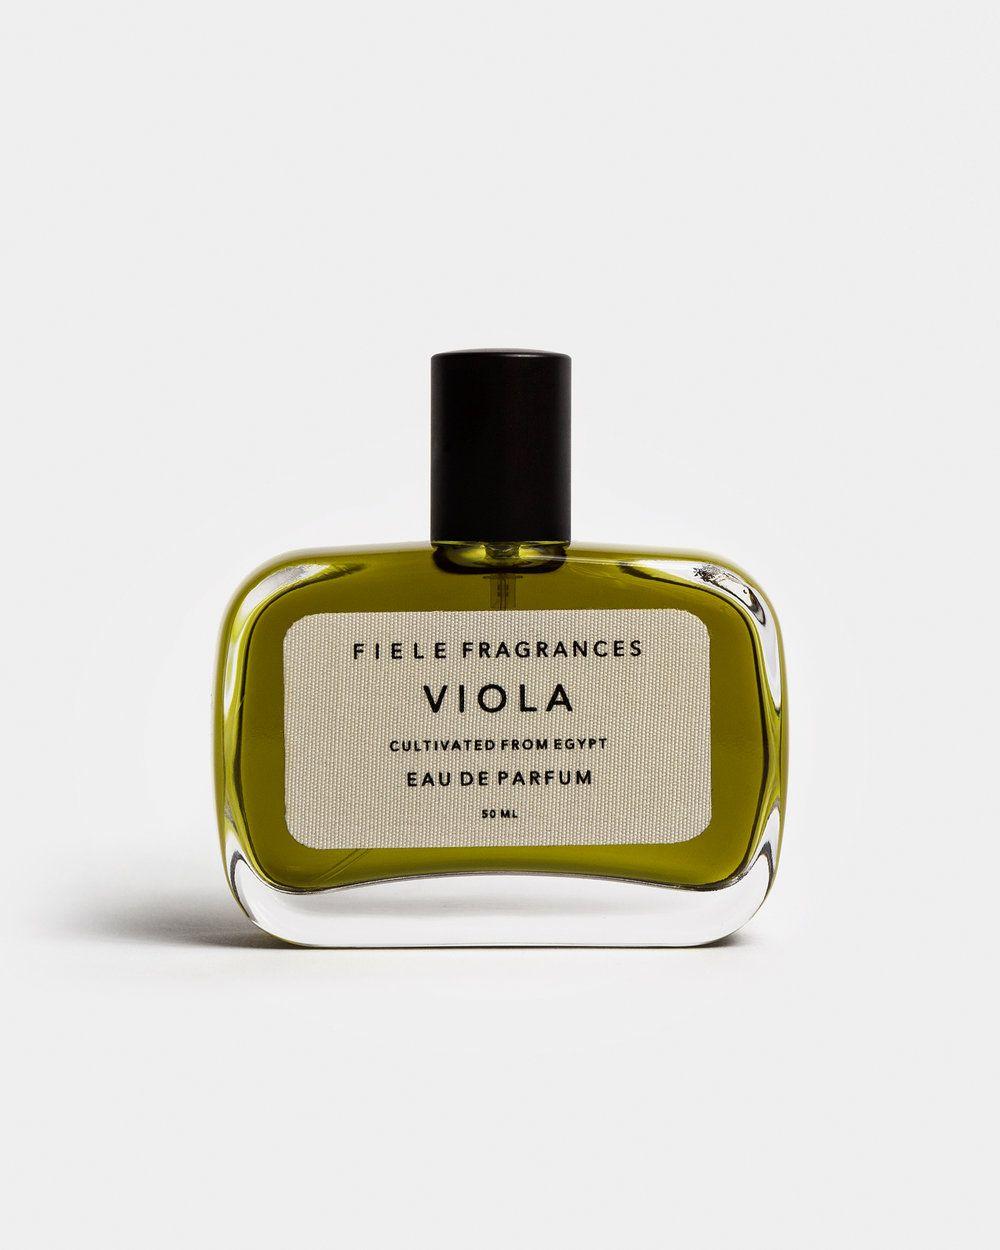 V I O L A eau de parfum   Flowering plants and Business cards